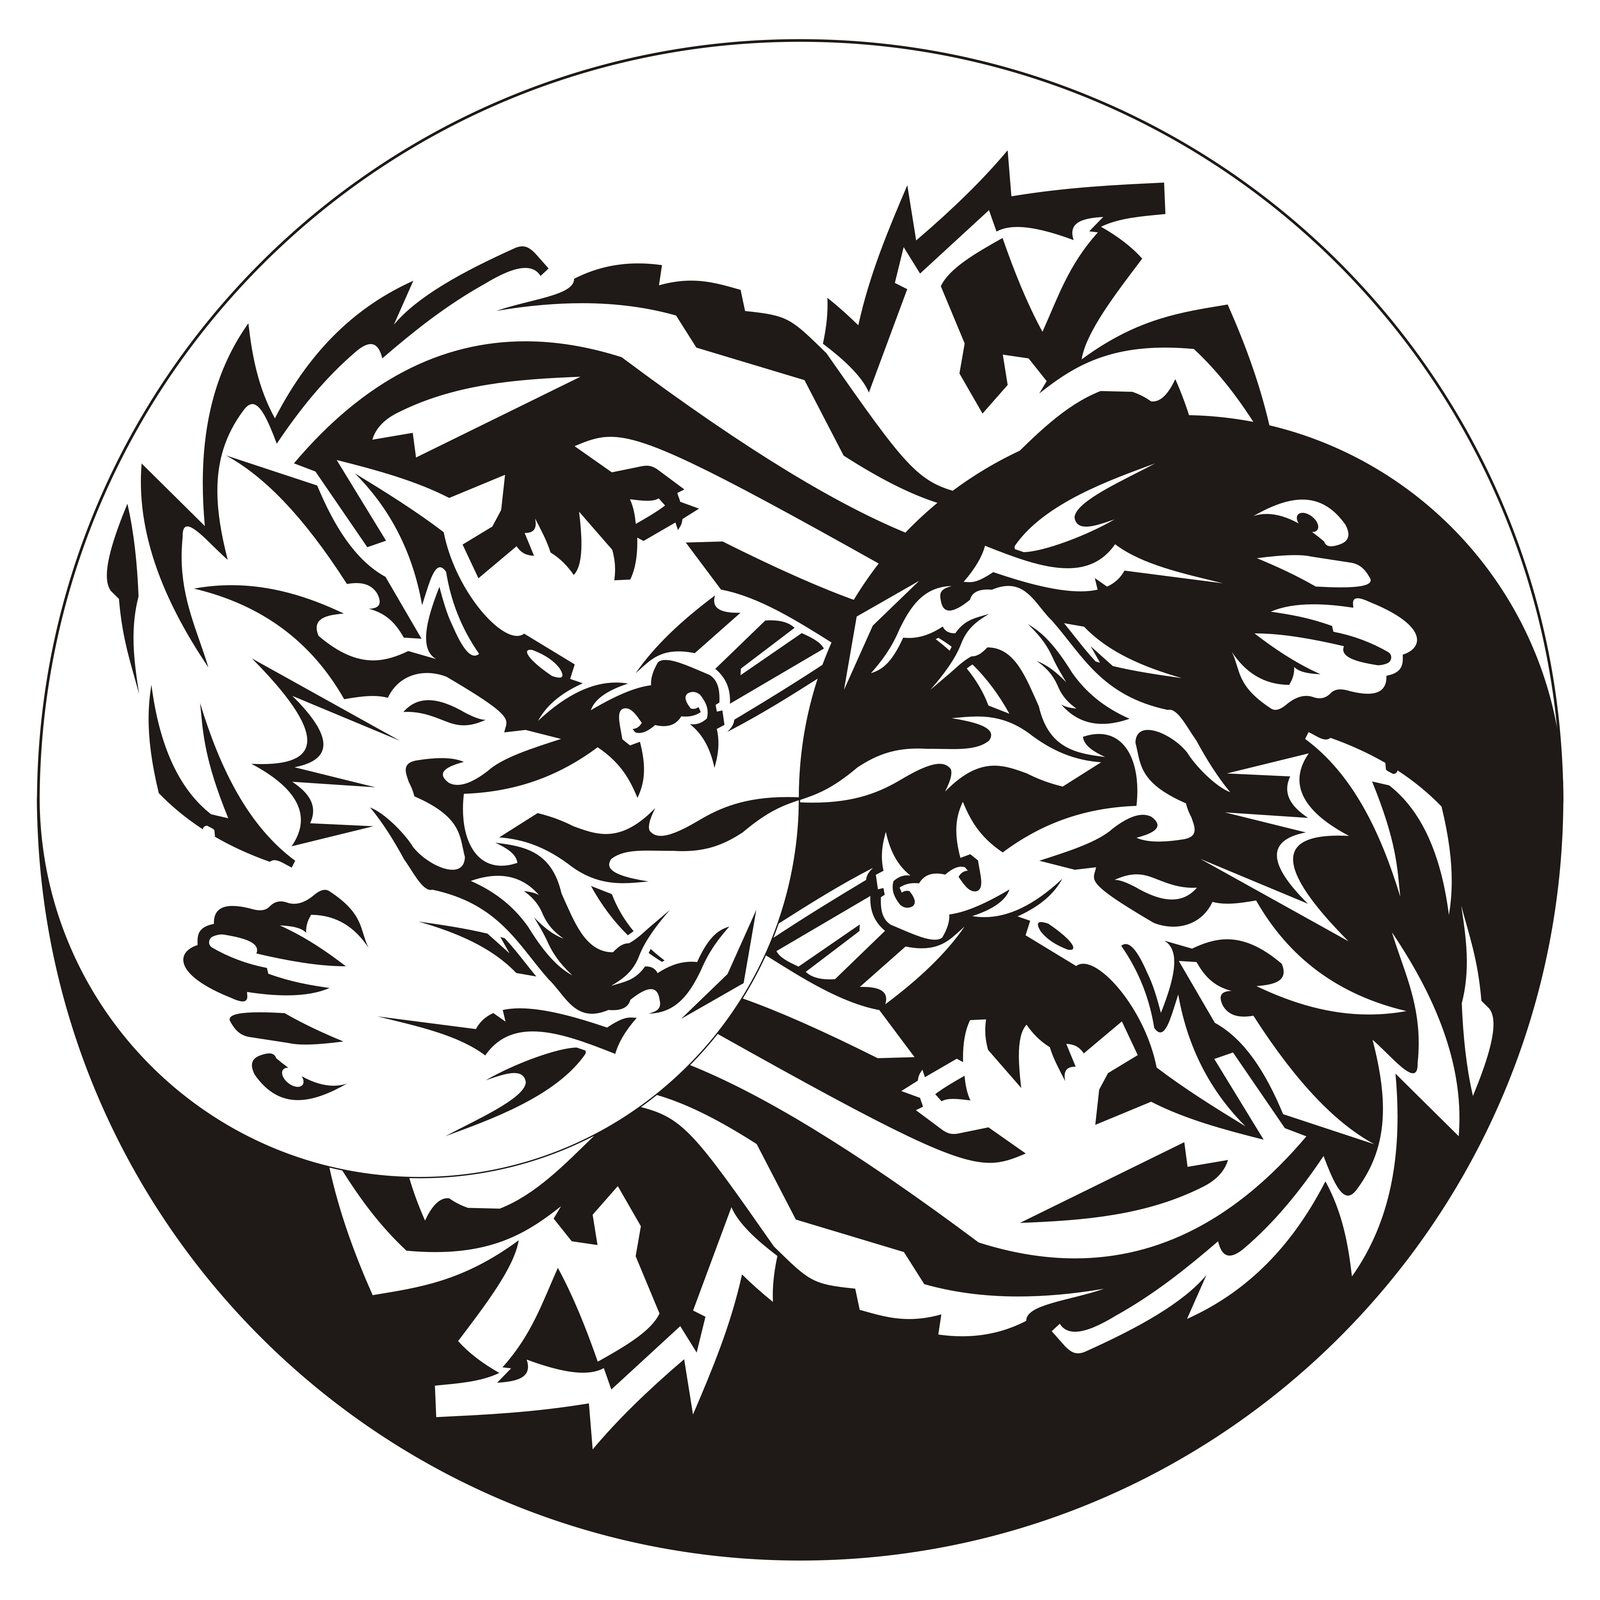 Chinese Ying Yang Tattoo Graphic photo - 1